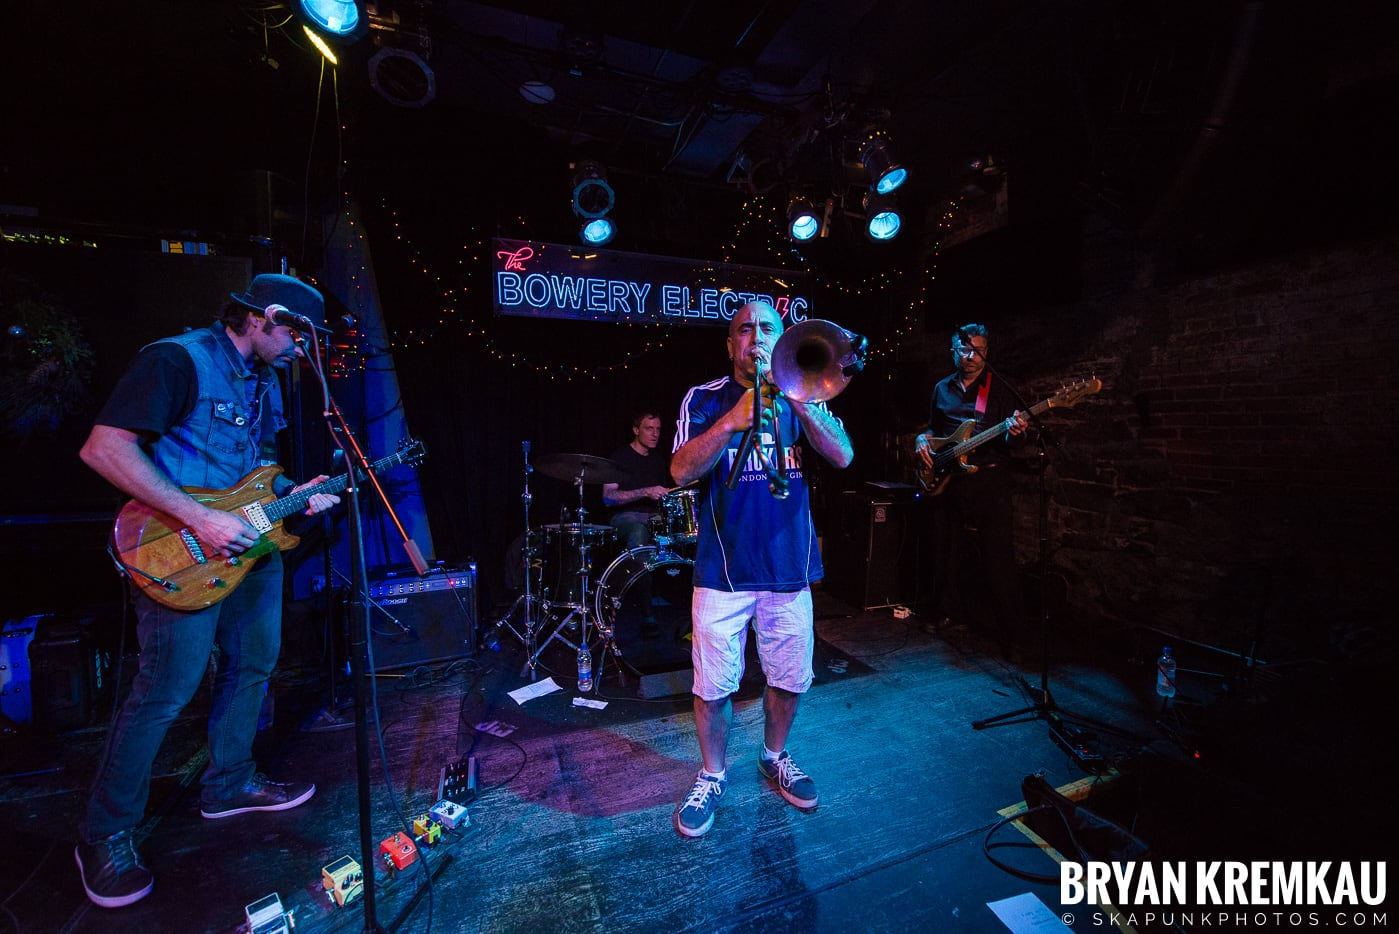 Cenzo @ Bowery Electric, NYC - 11.17.18 (43)